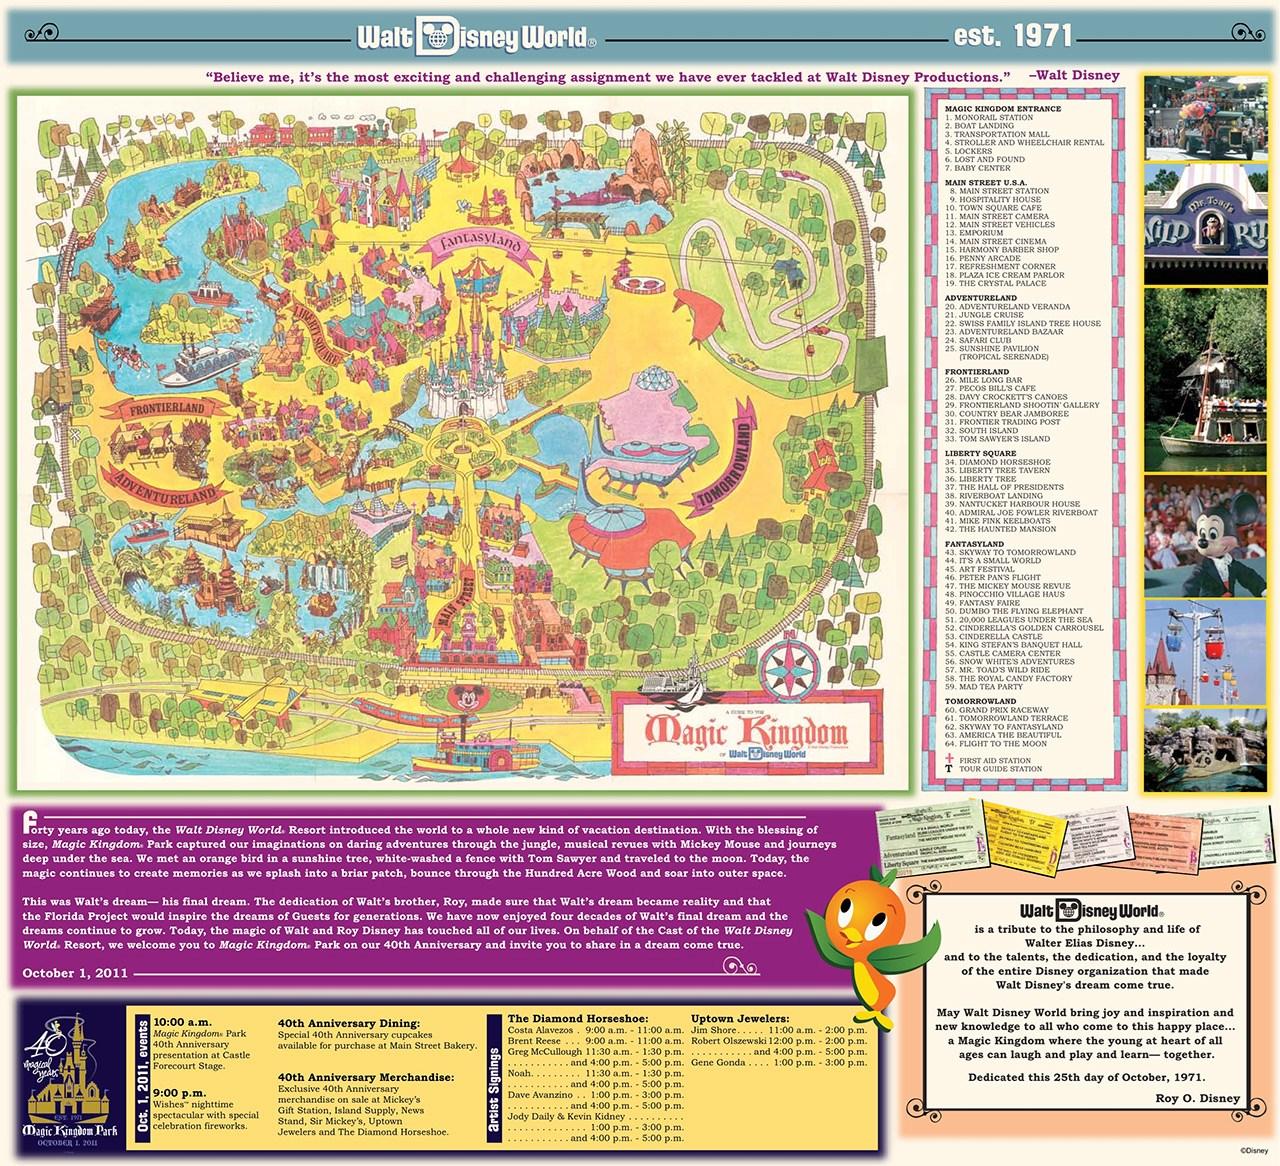 Magic Kingdom 40th Anniversary